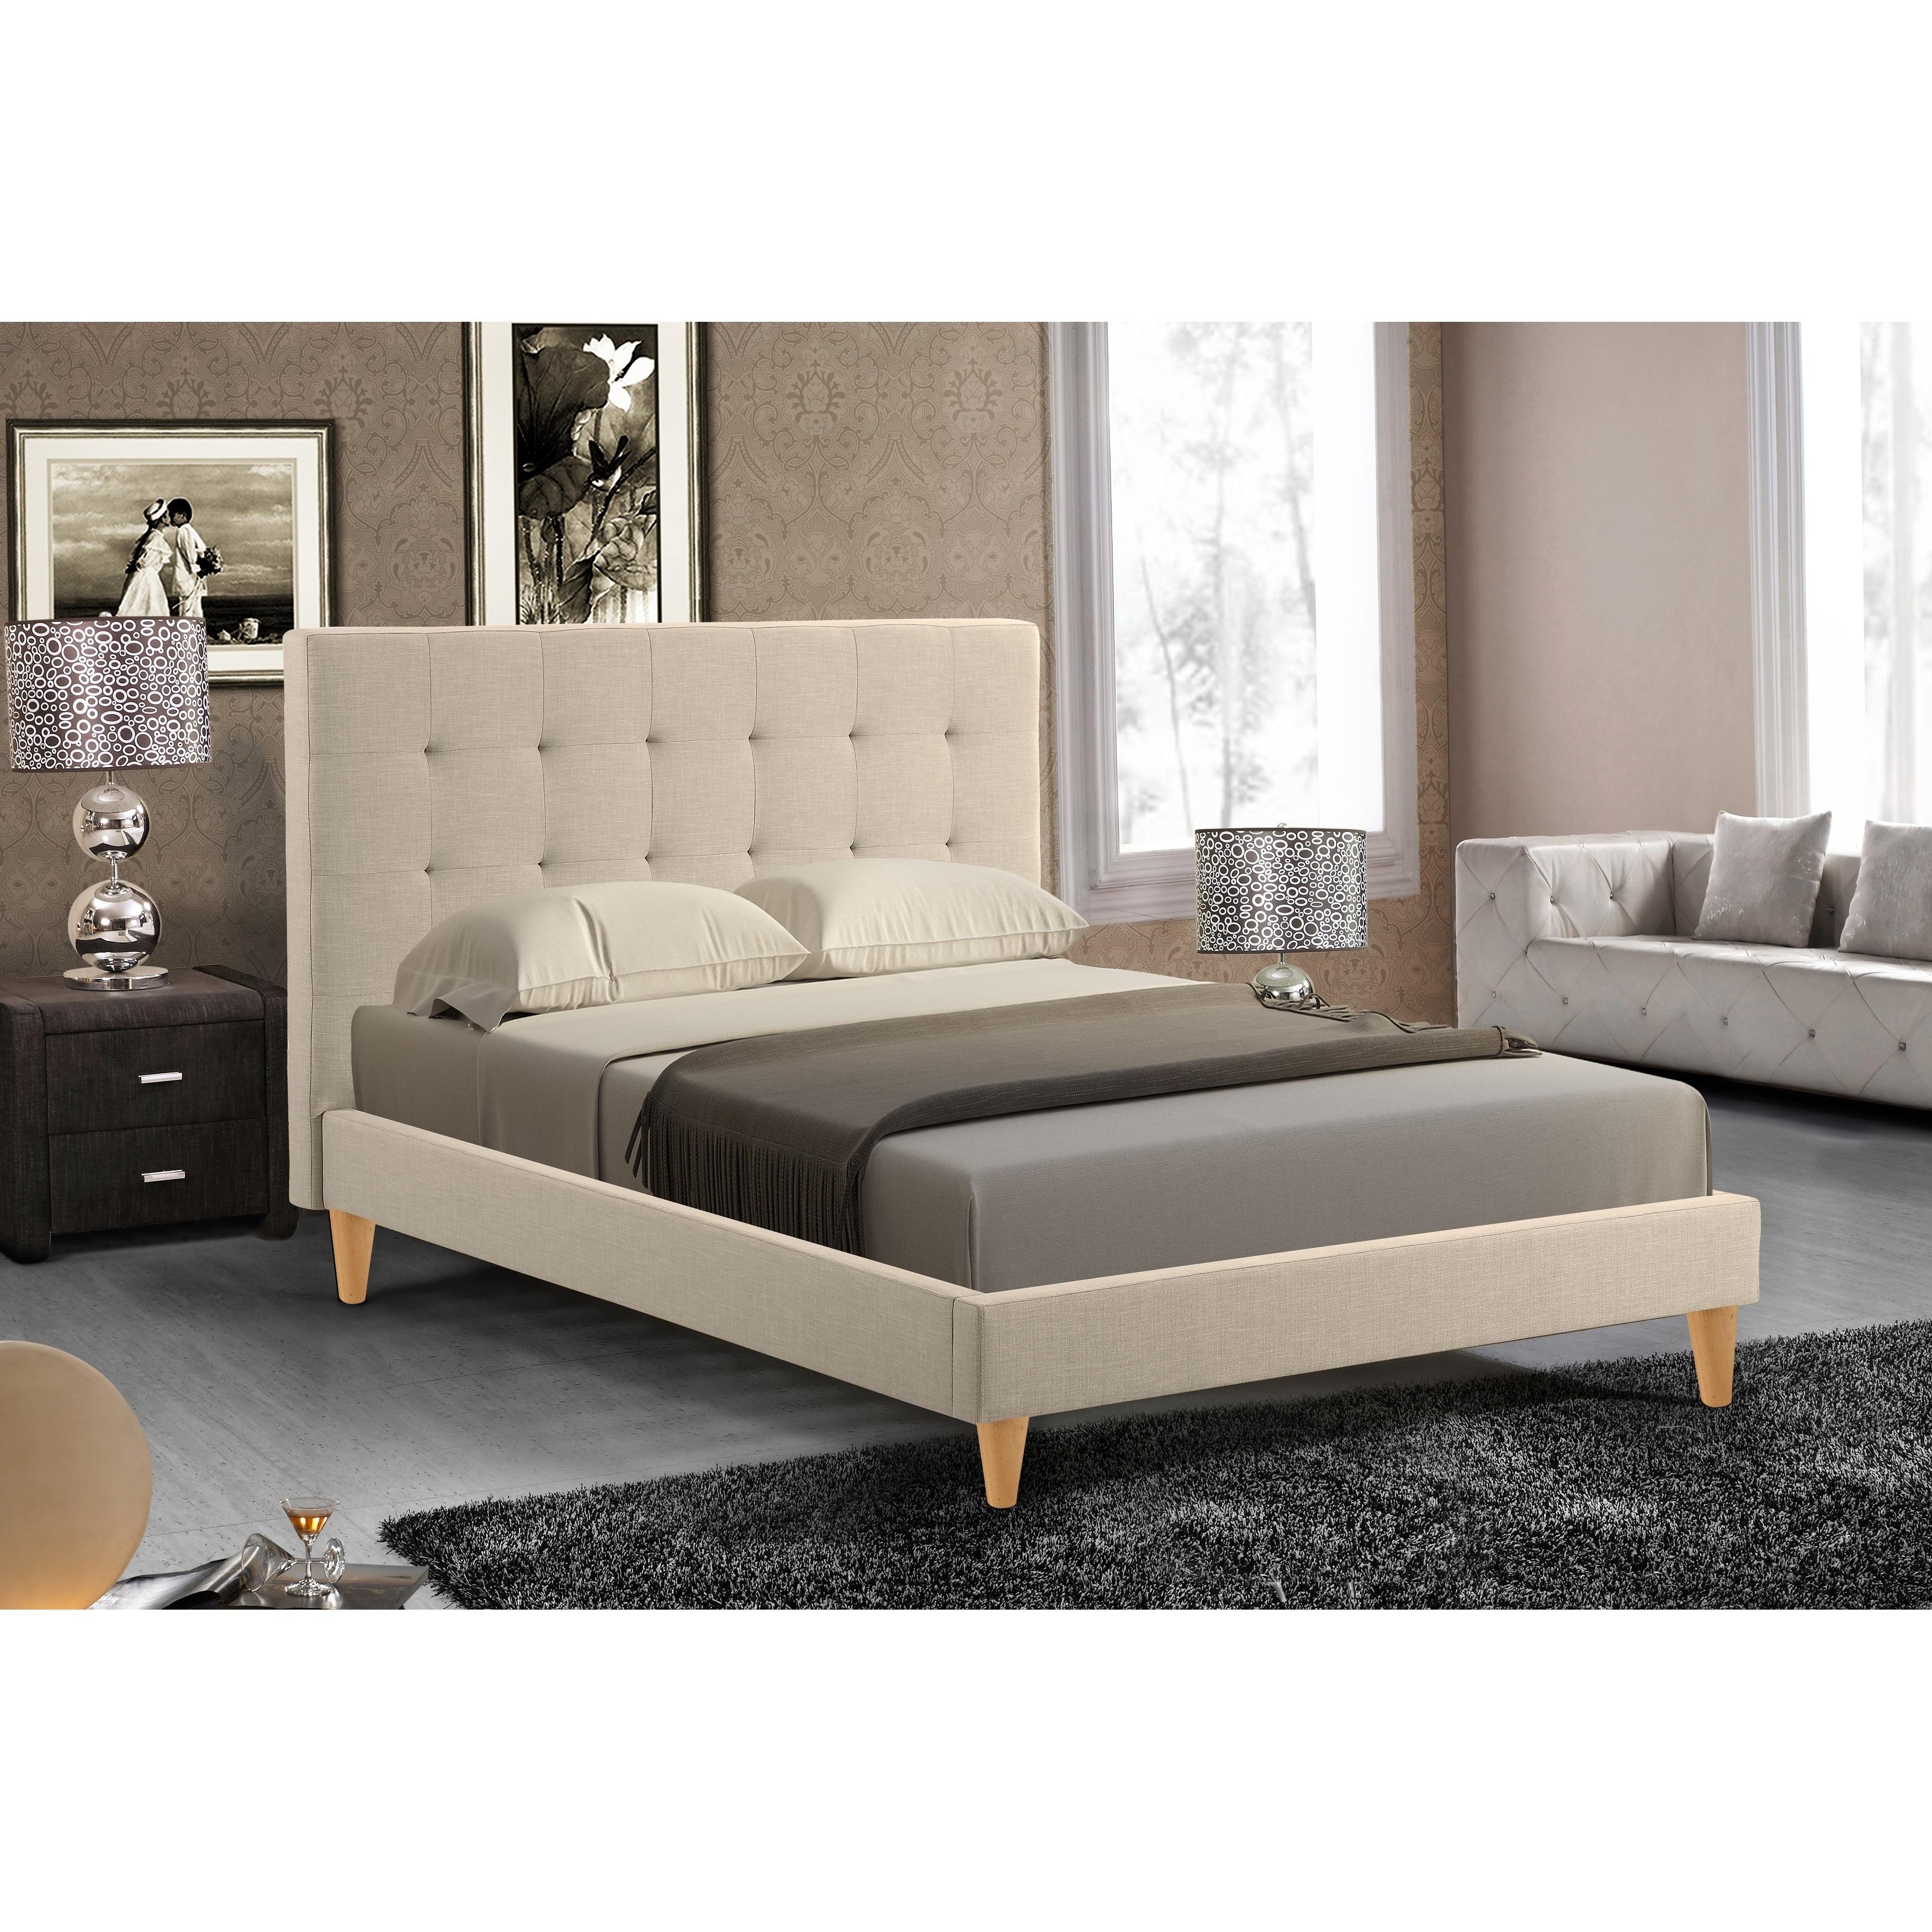 Abbyson Brennan Ivory Tufted Platform Bed (King), Black